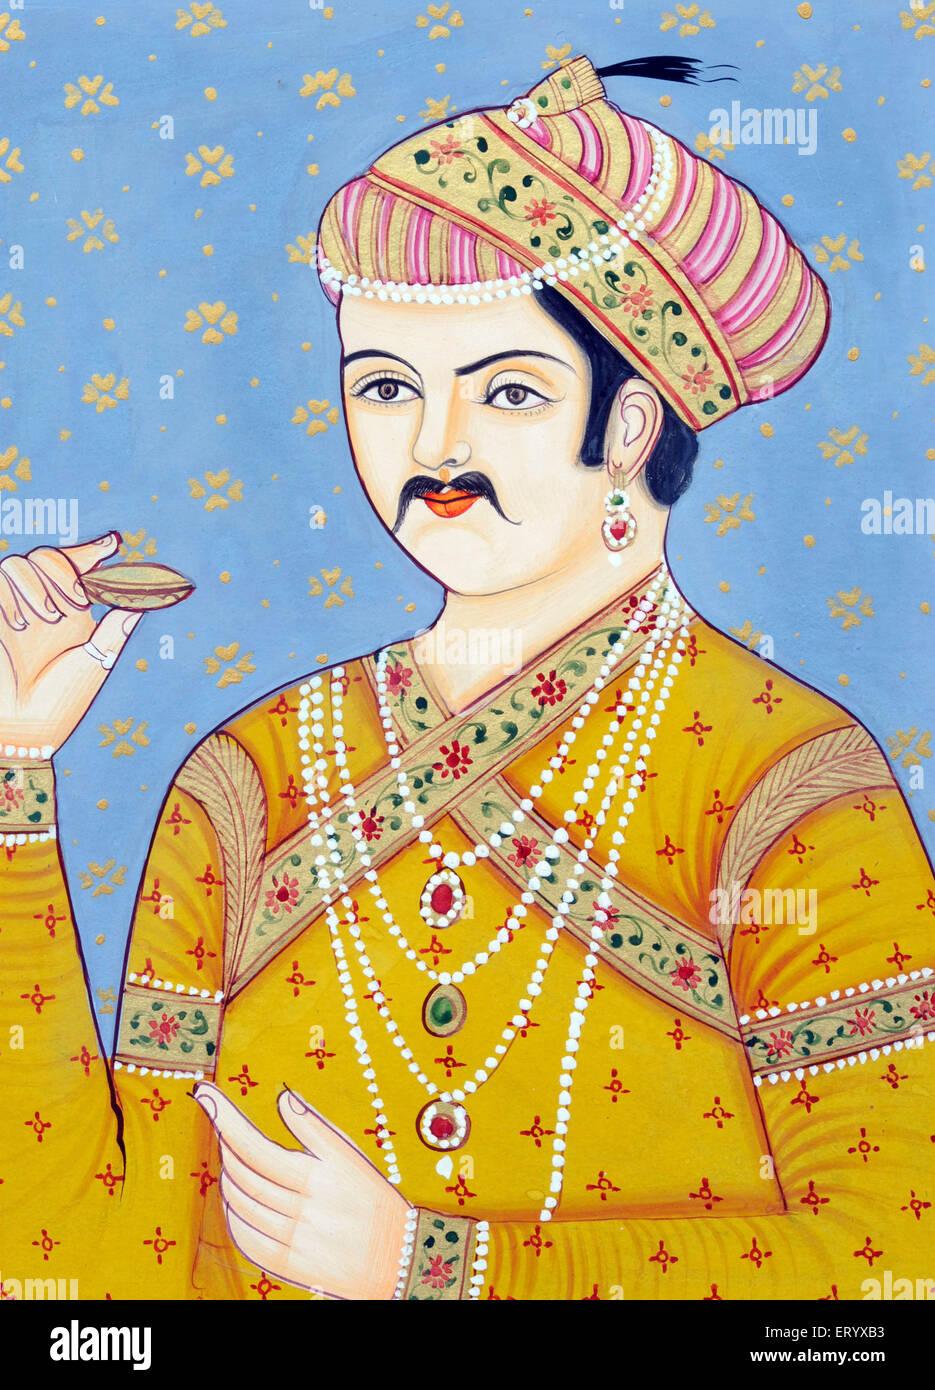 Miniature painting of Mughul Emperor Akbar - Stock Image